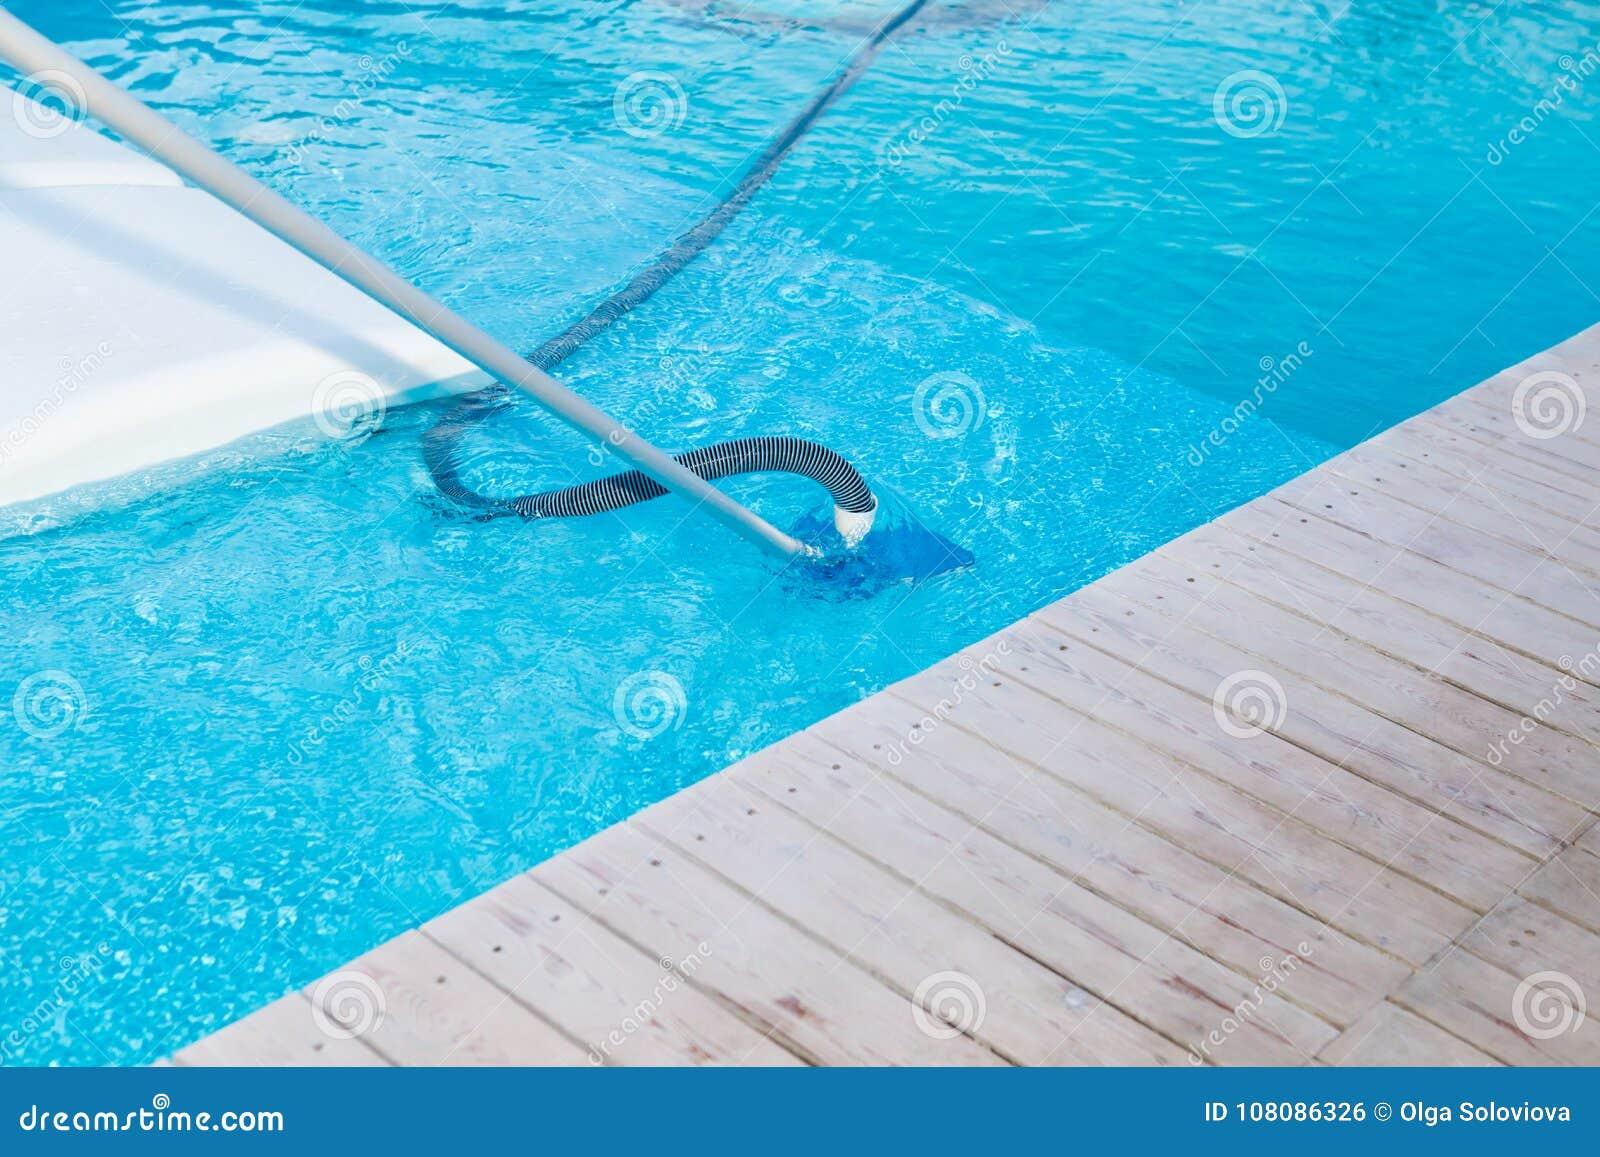 Swimming Pool Vacuum Cleaner Stock Photo - Image of aqua ...